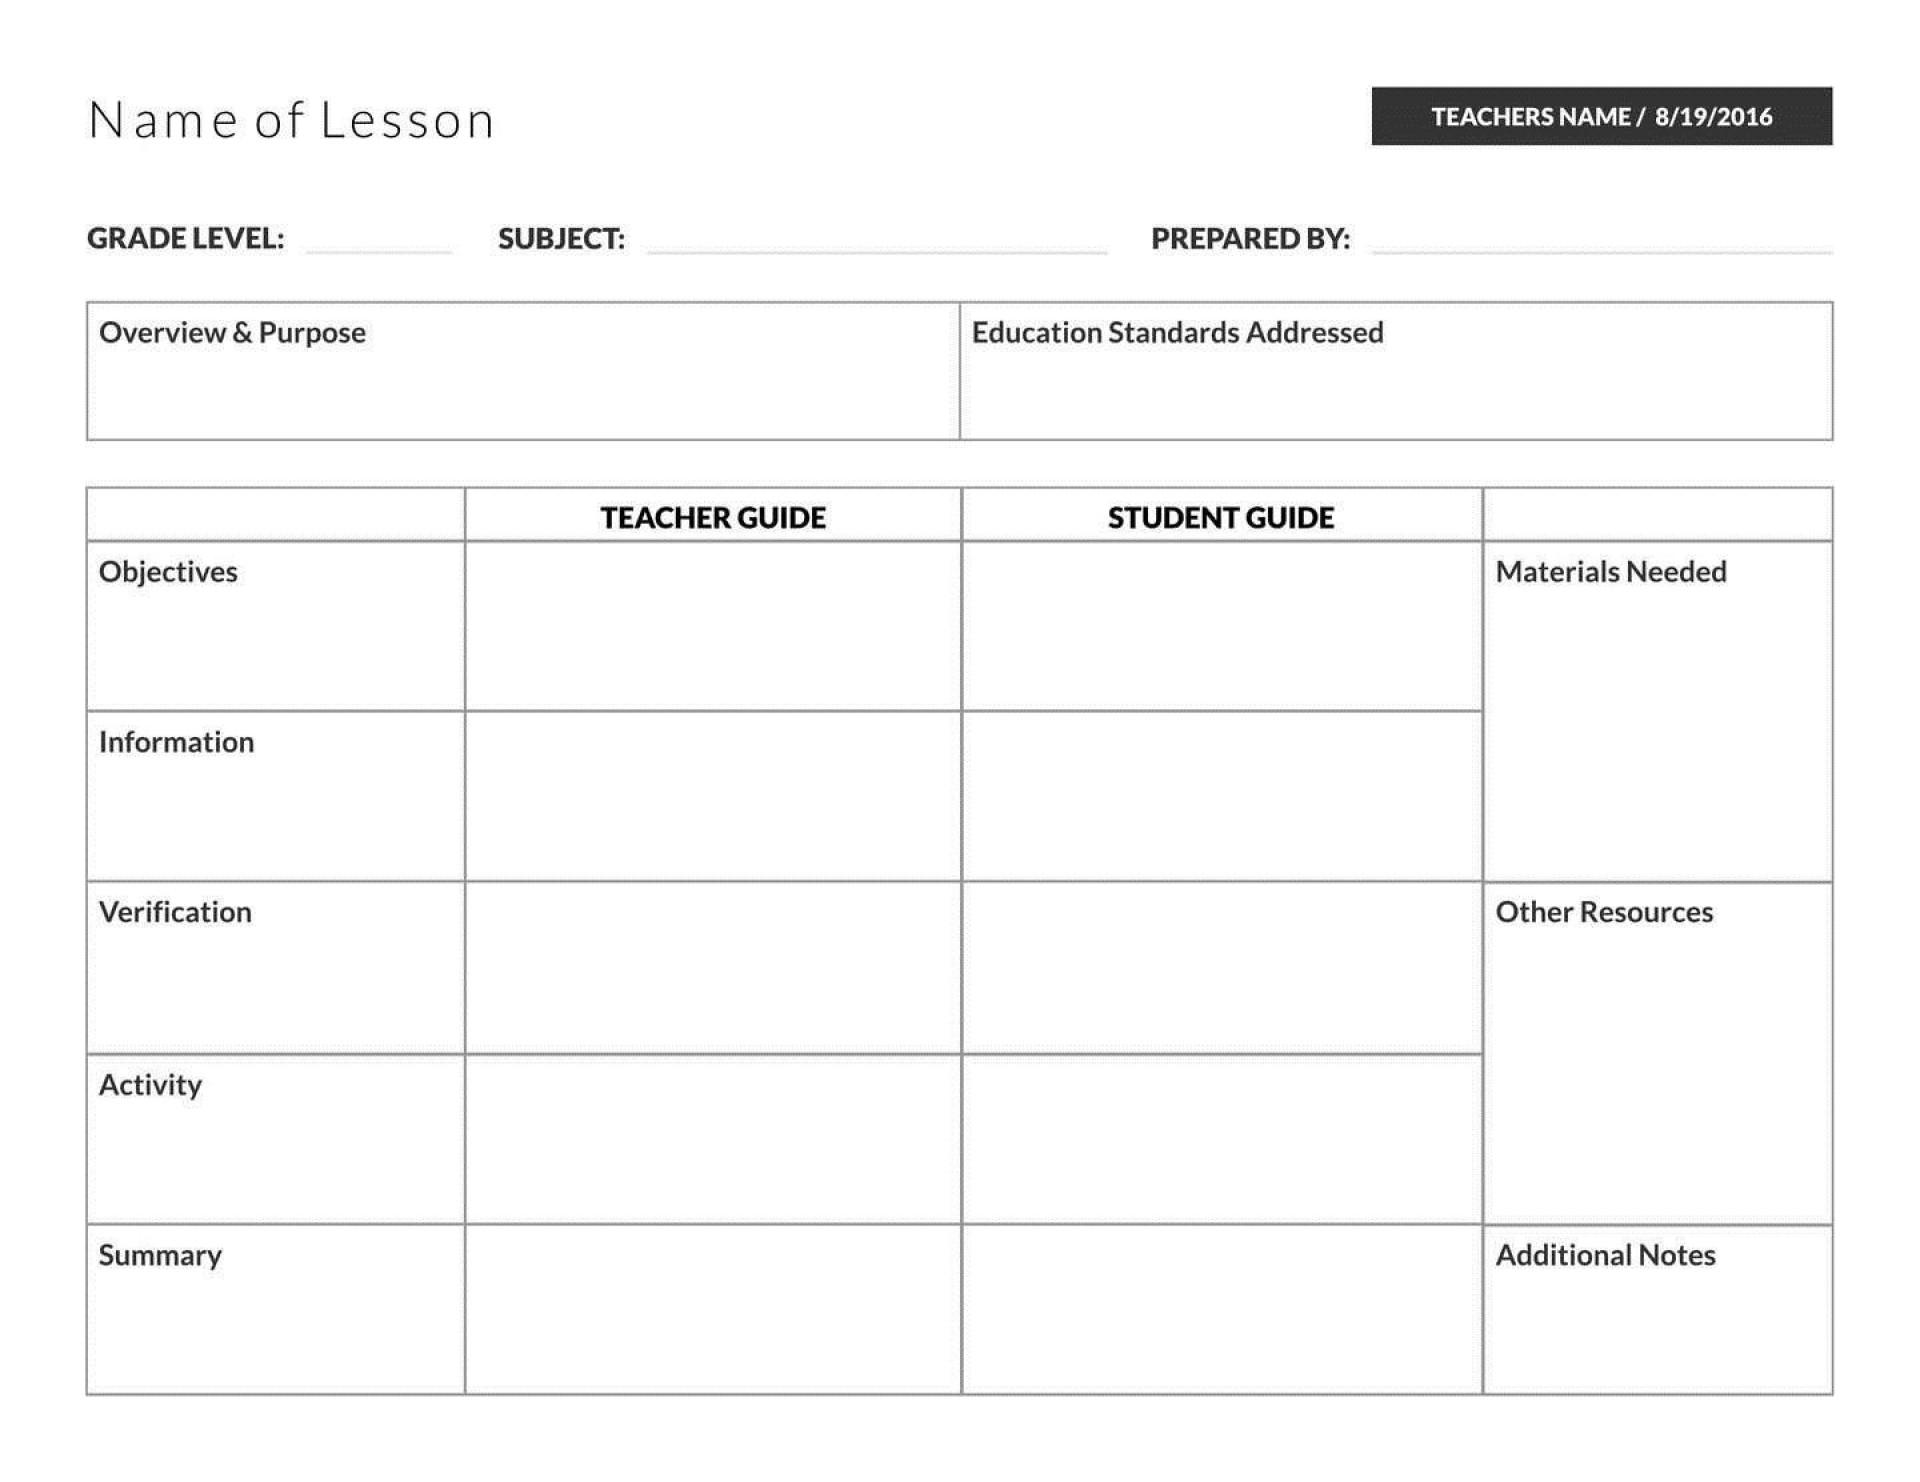 004 Marvelou Lesson Plan Template Free High Def  Weekly Printable Editable Preschool Format1920